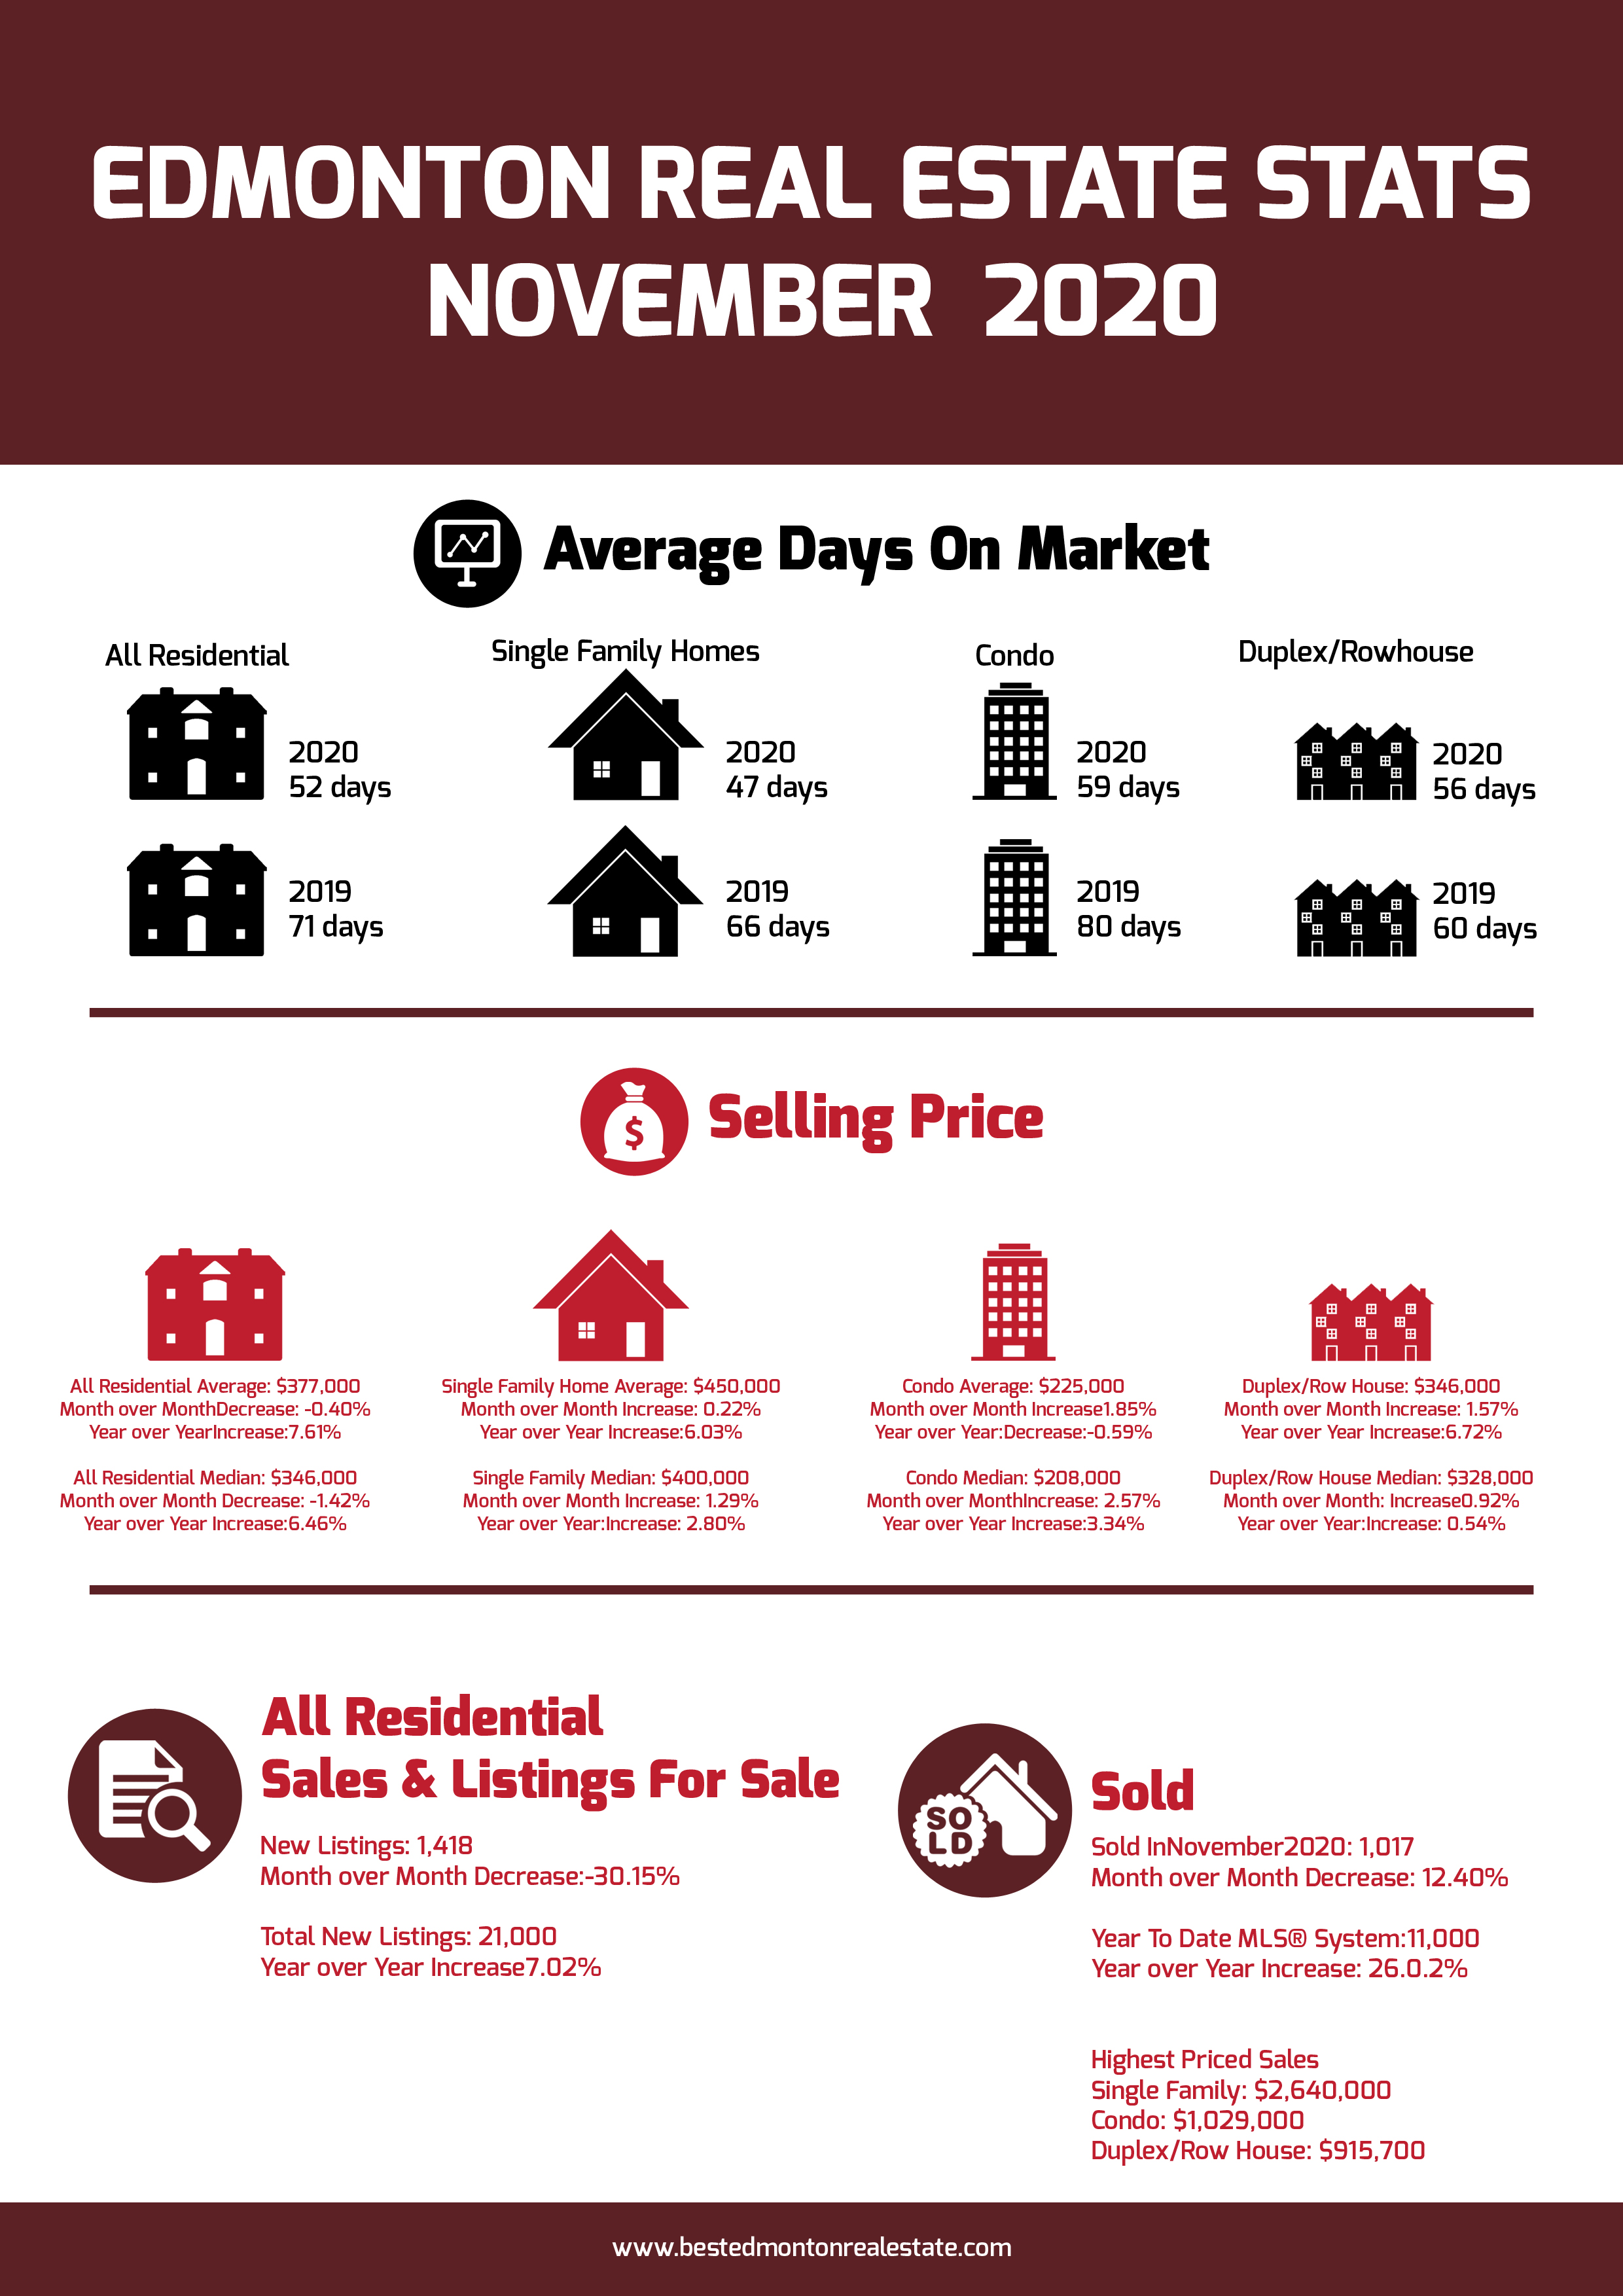 Edmonton Real Estate Stats November 2020